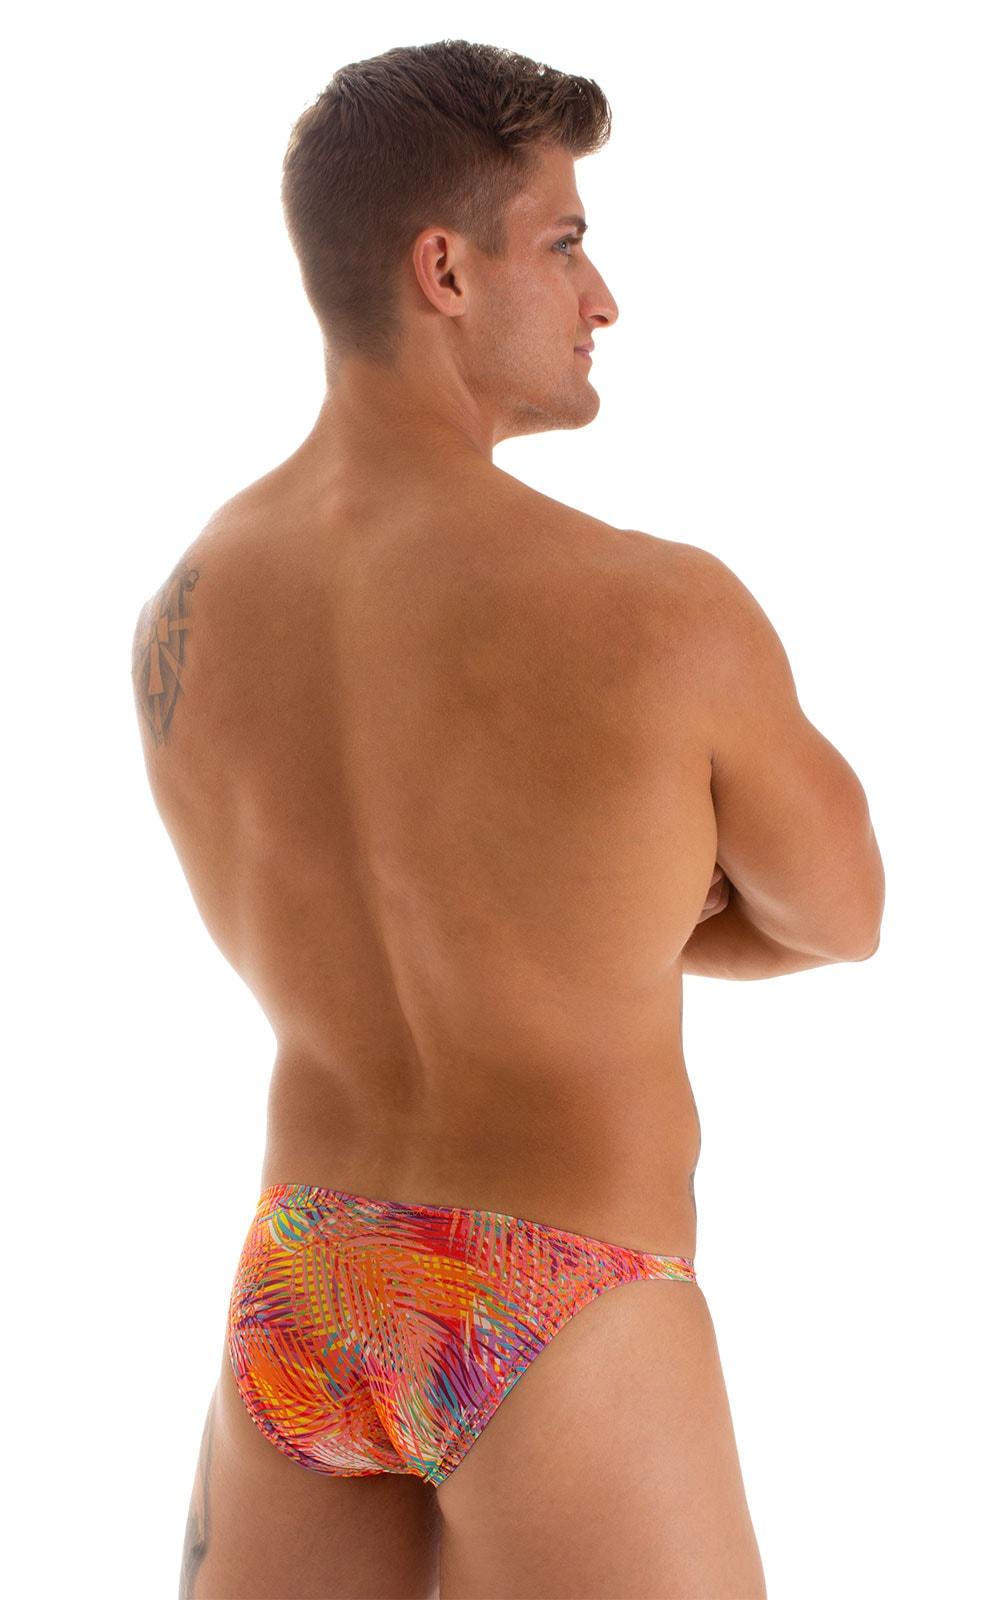 Stuffit Pouch Bikini Swimsuit in Tan Through Orange Jungle 2